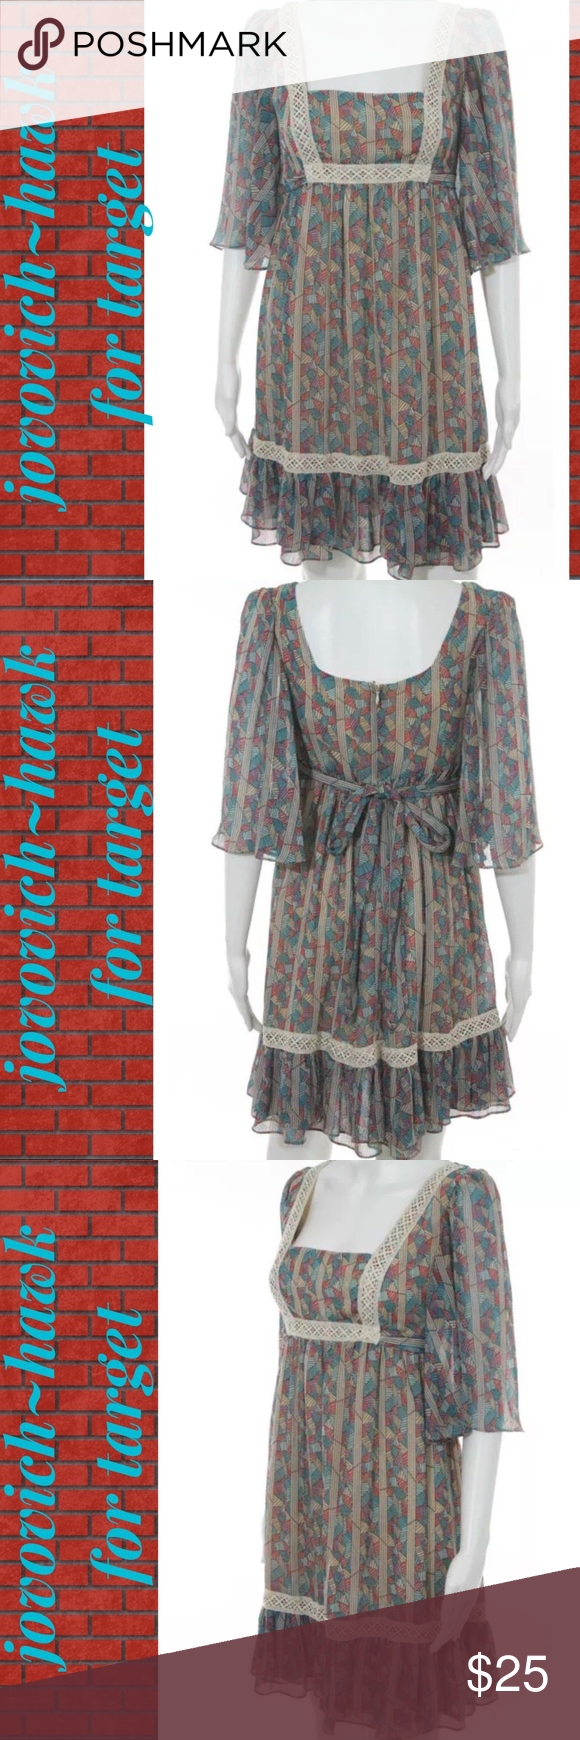 Jououich hawk sheer redblue peasant dress peasant dresses